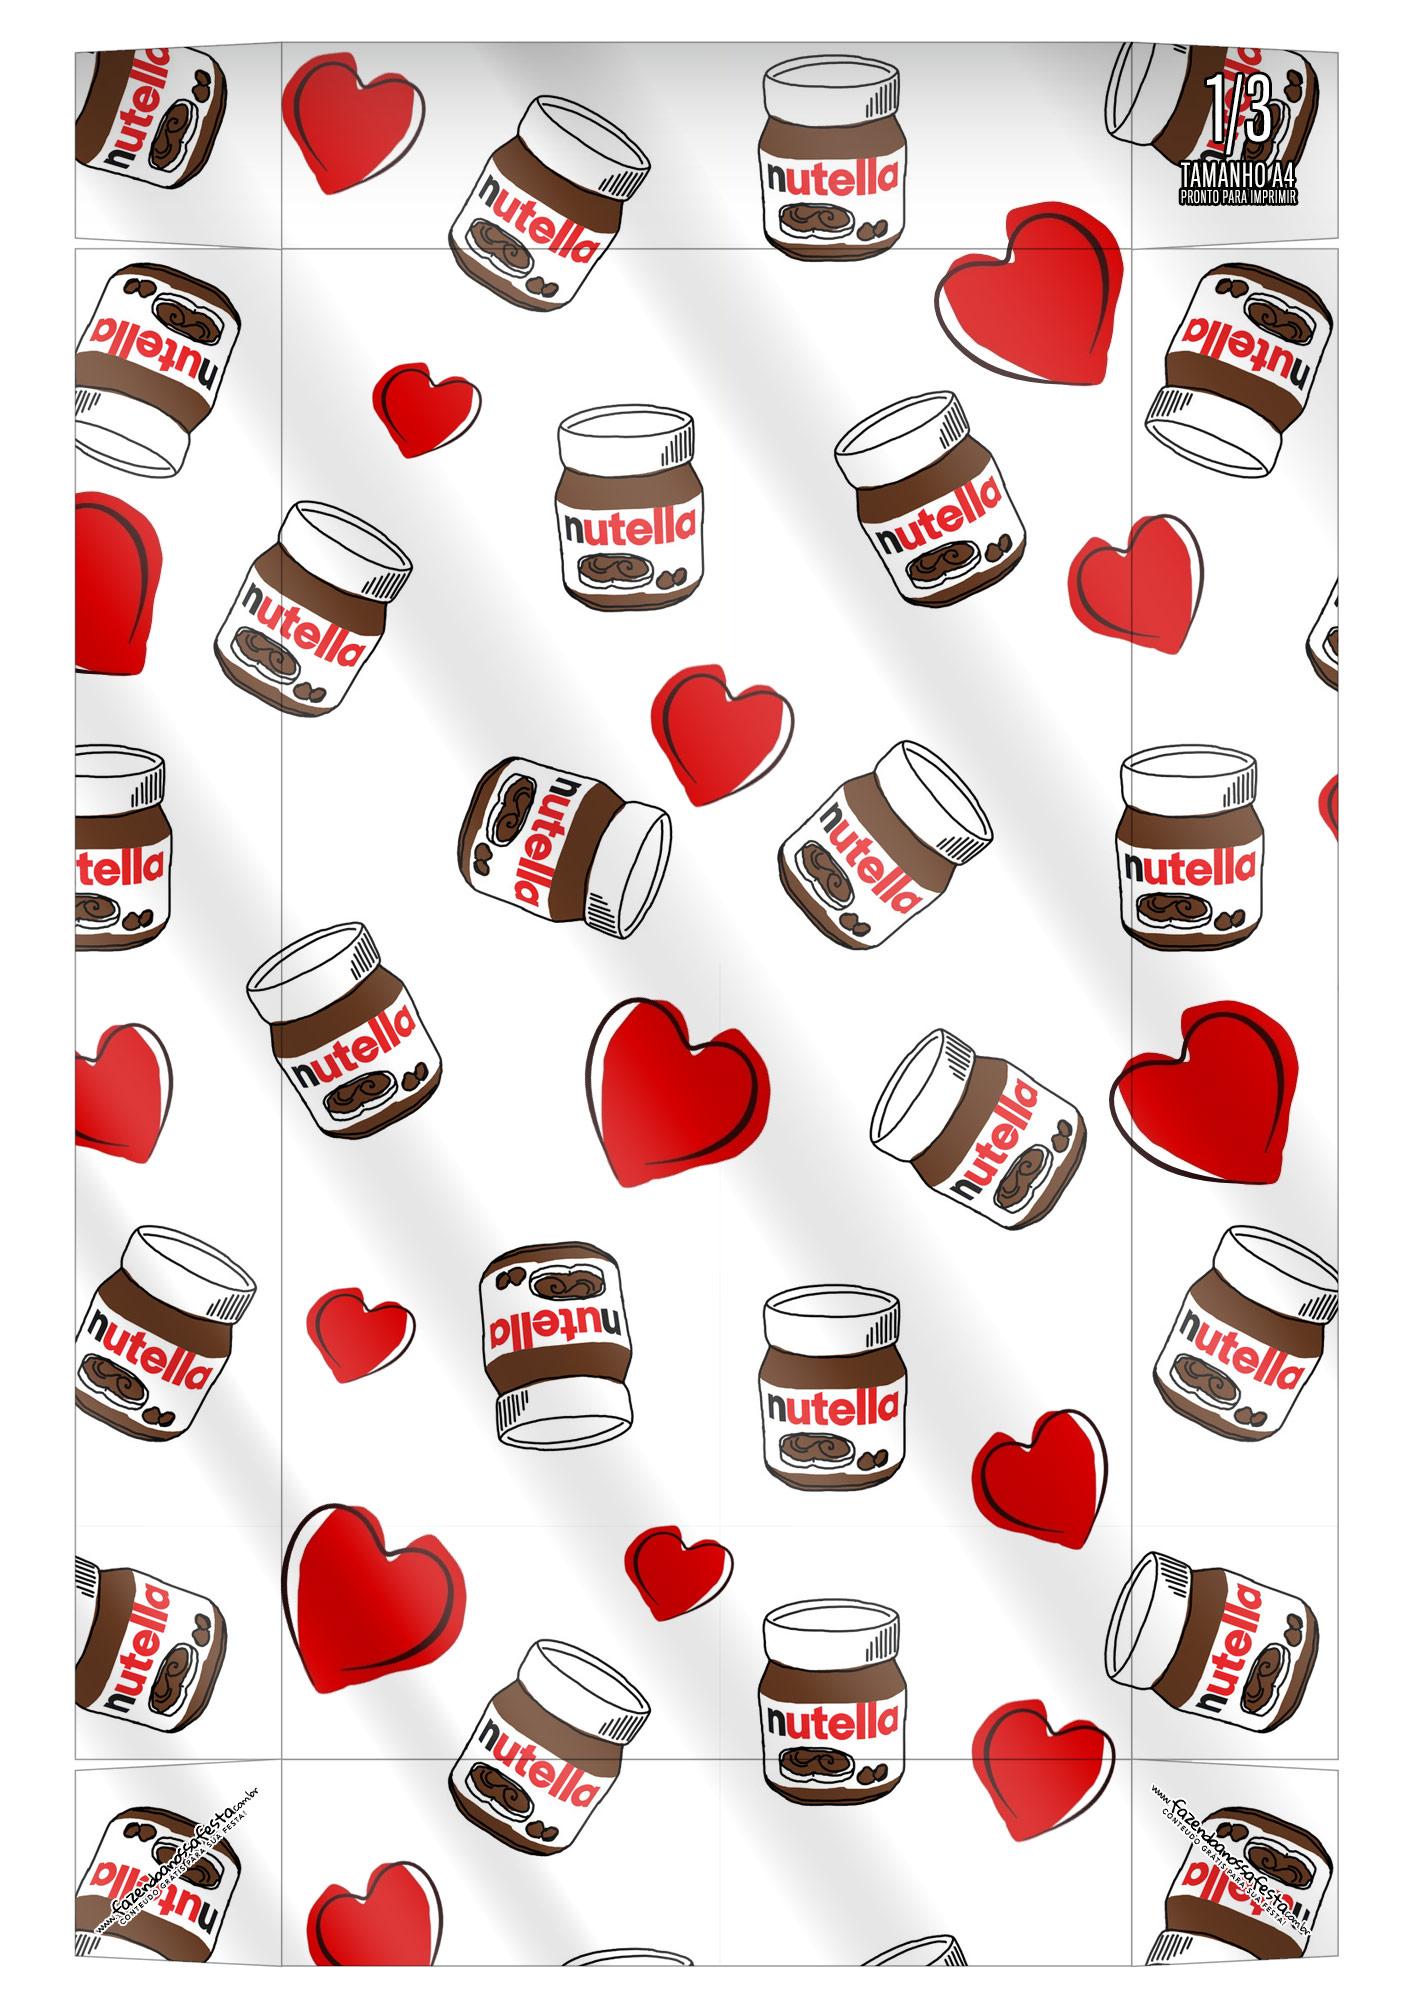 Caixa Kit Mini Confeiteiro Chocolates Nutella parte de baixo